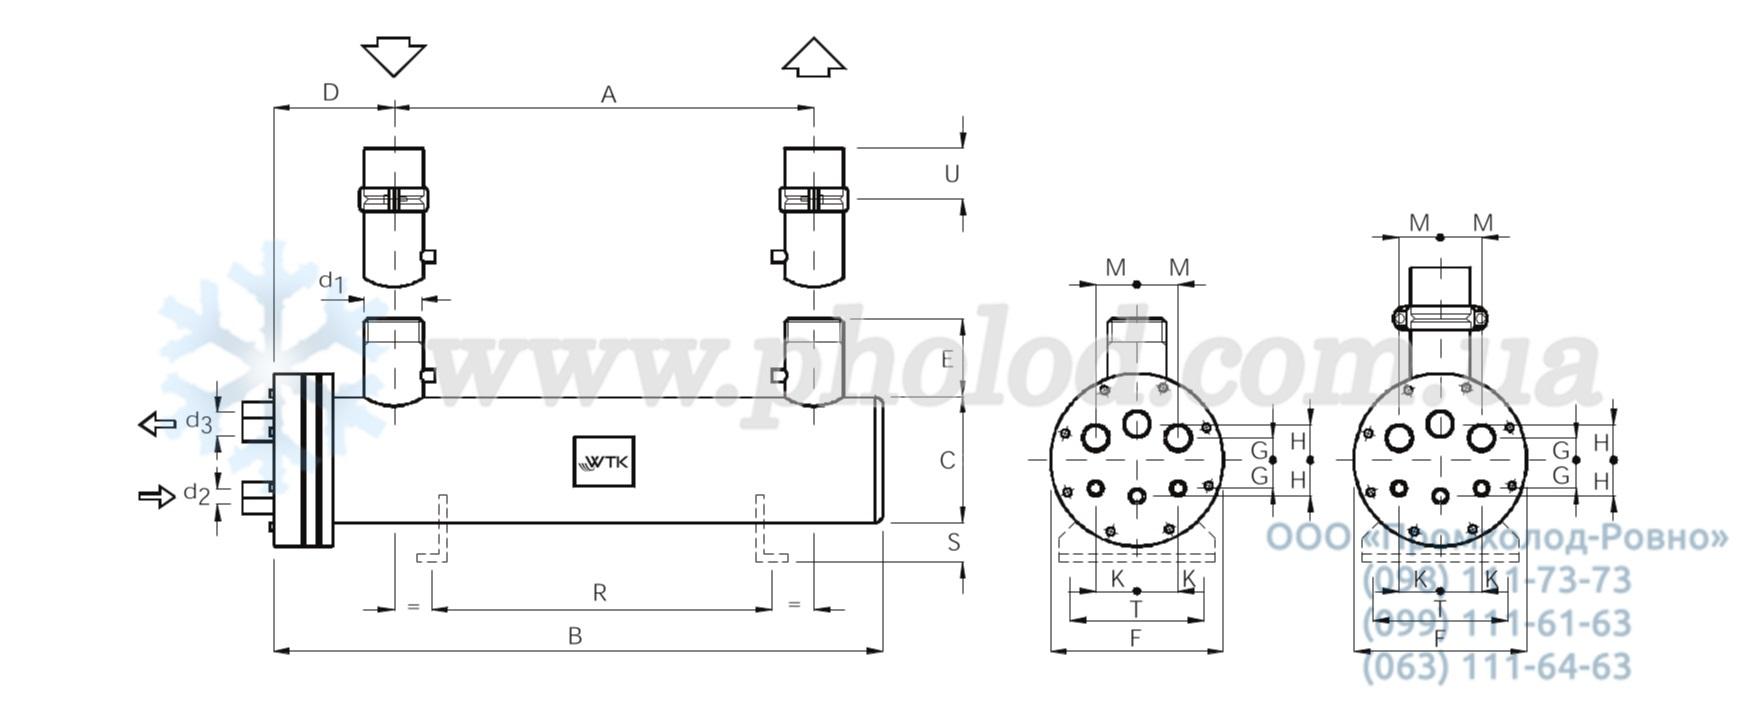 Кожухотрубный испаритель WTK TCE 513 Артём Уплотнения теплообменника Sondex S16 Балашиха